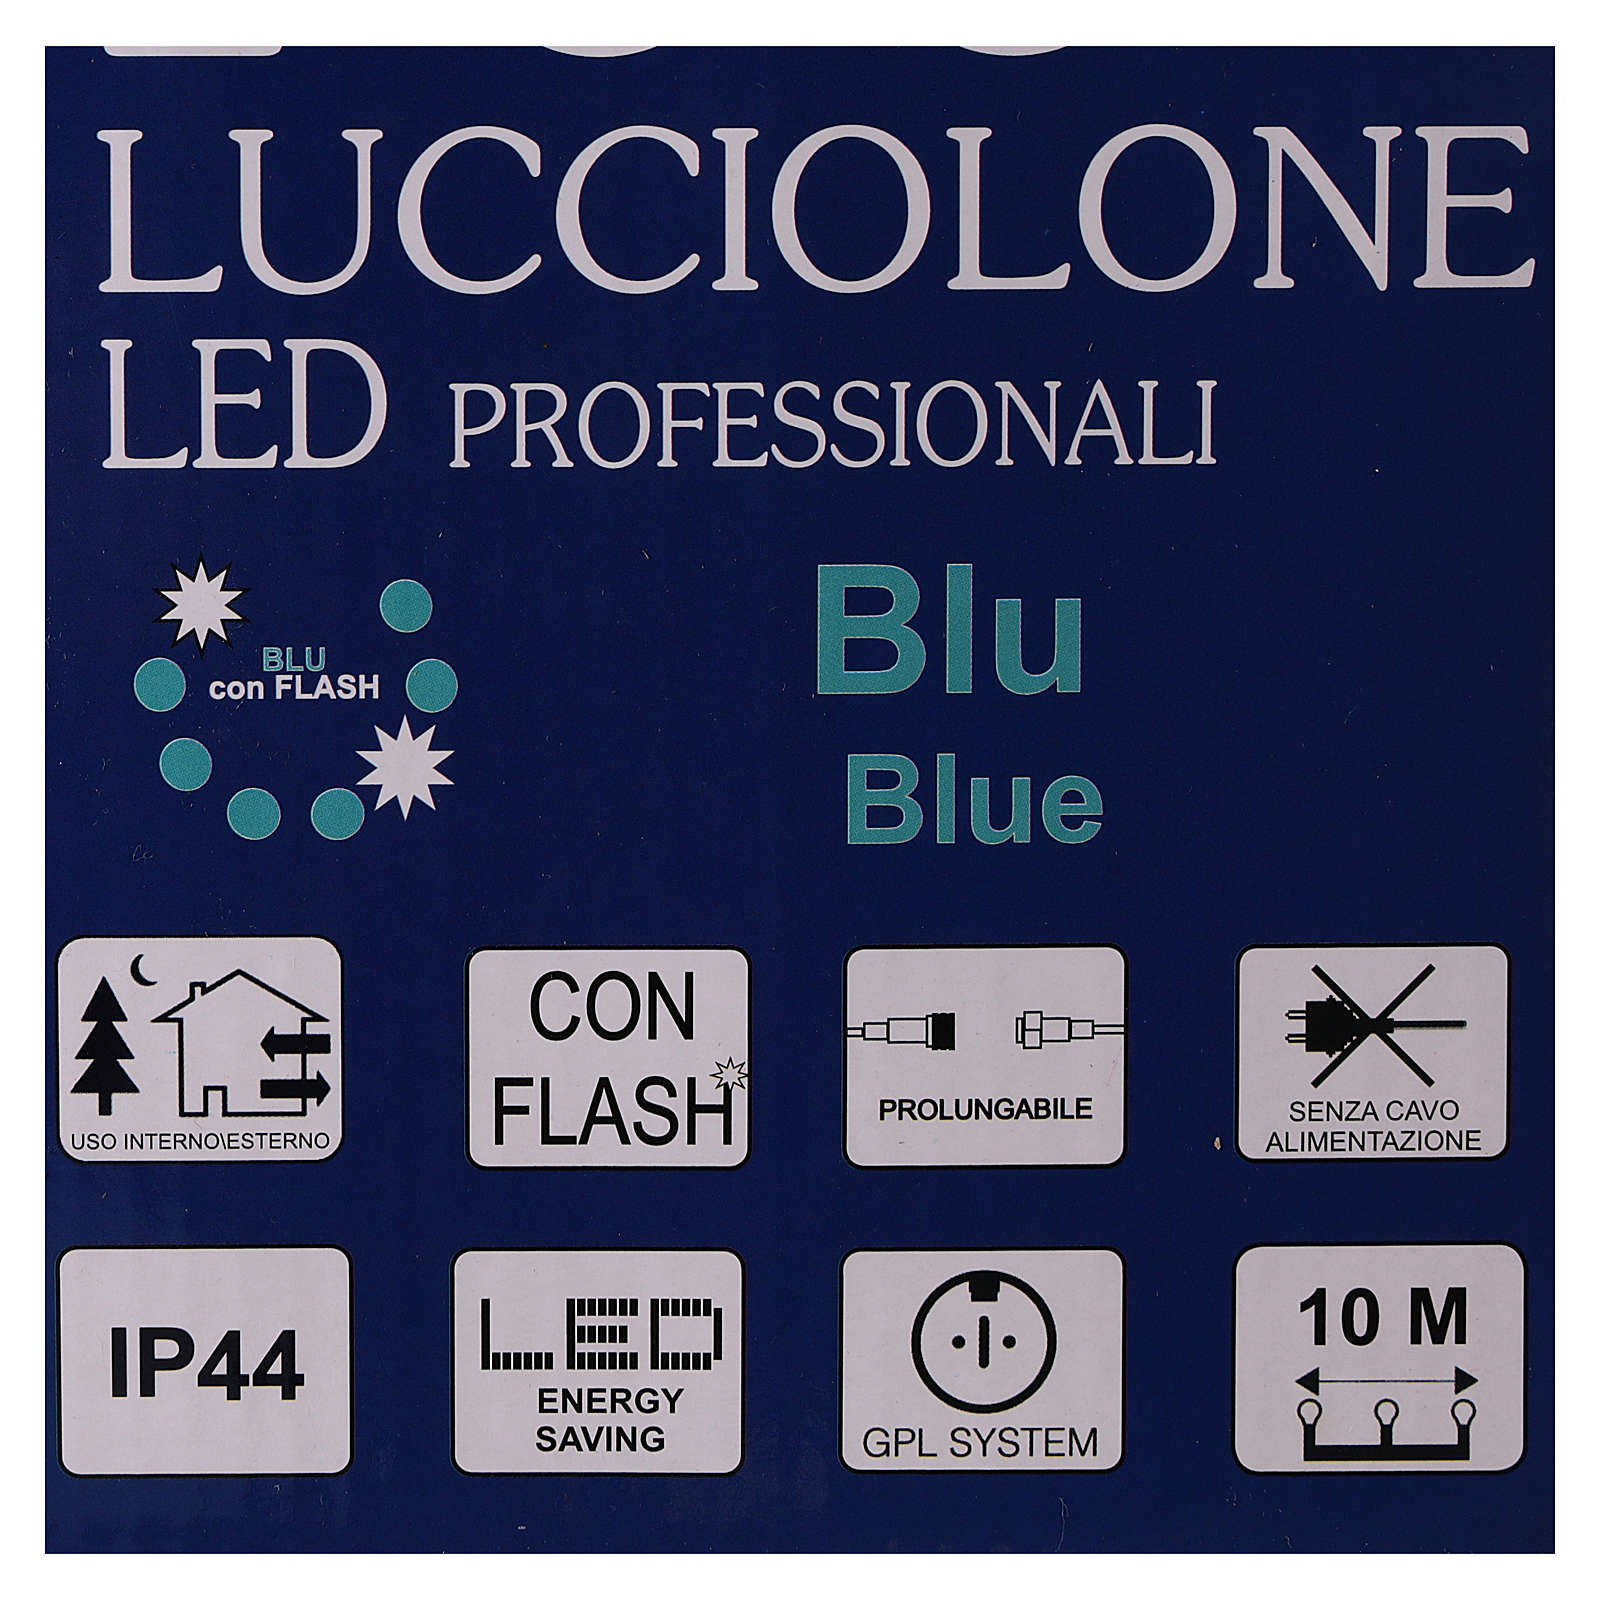 Cadena luminosa 10 m 100 led azul sin alimentador exterior corriente 3